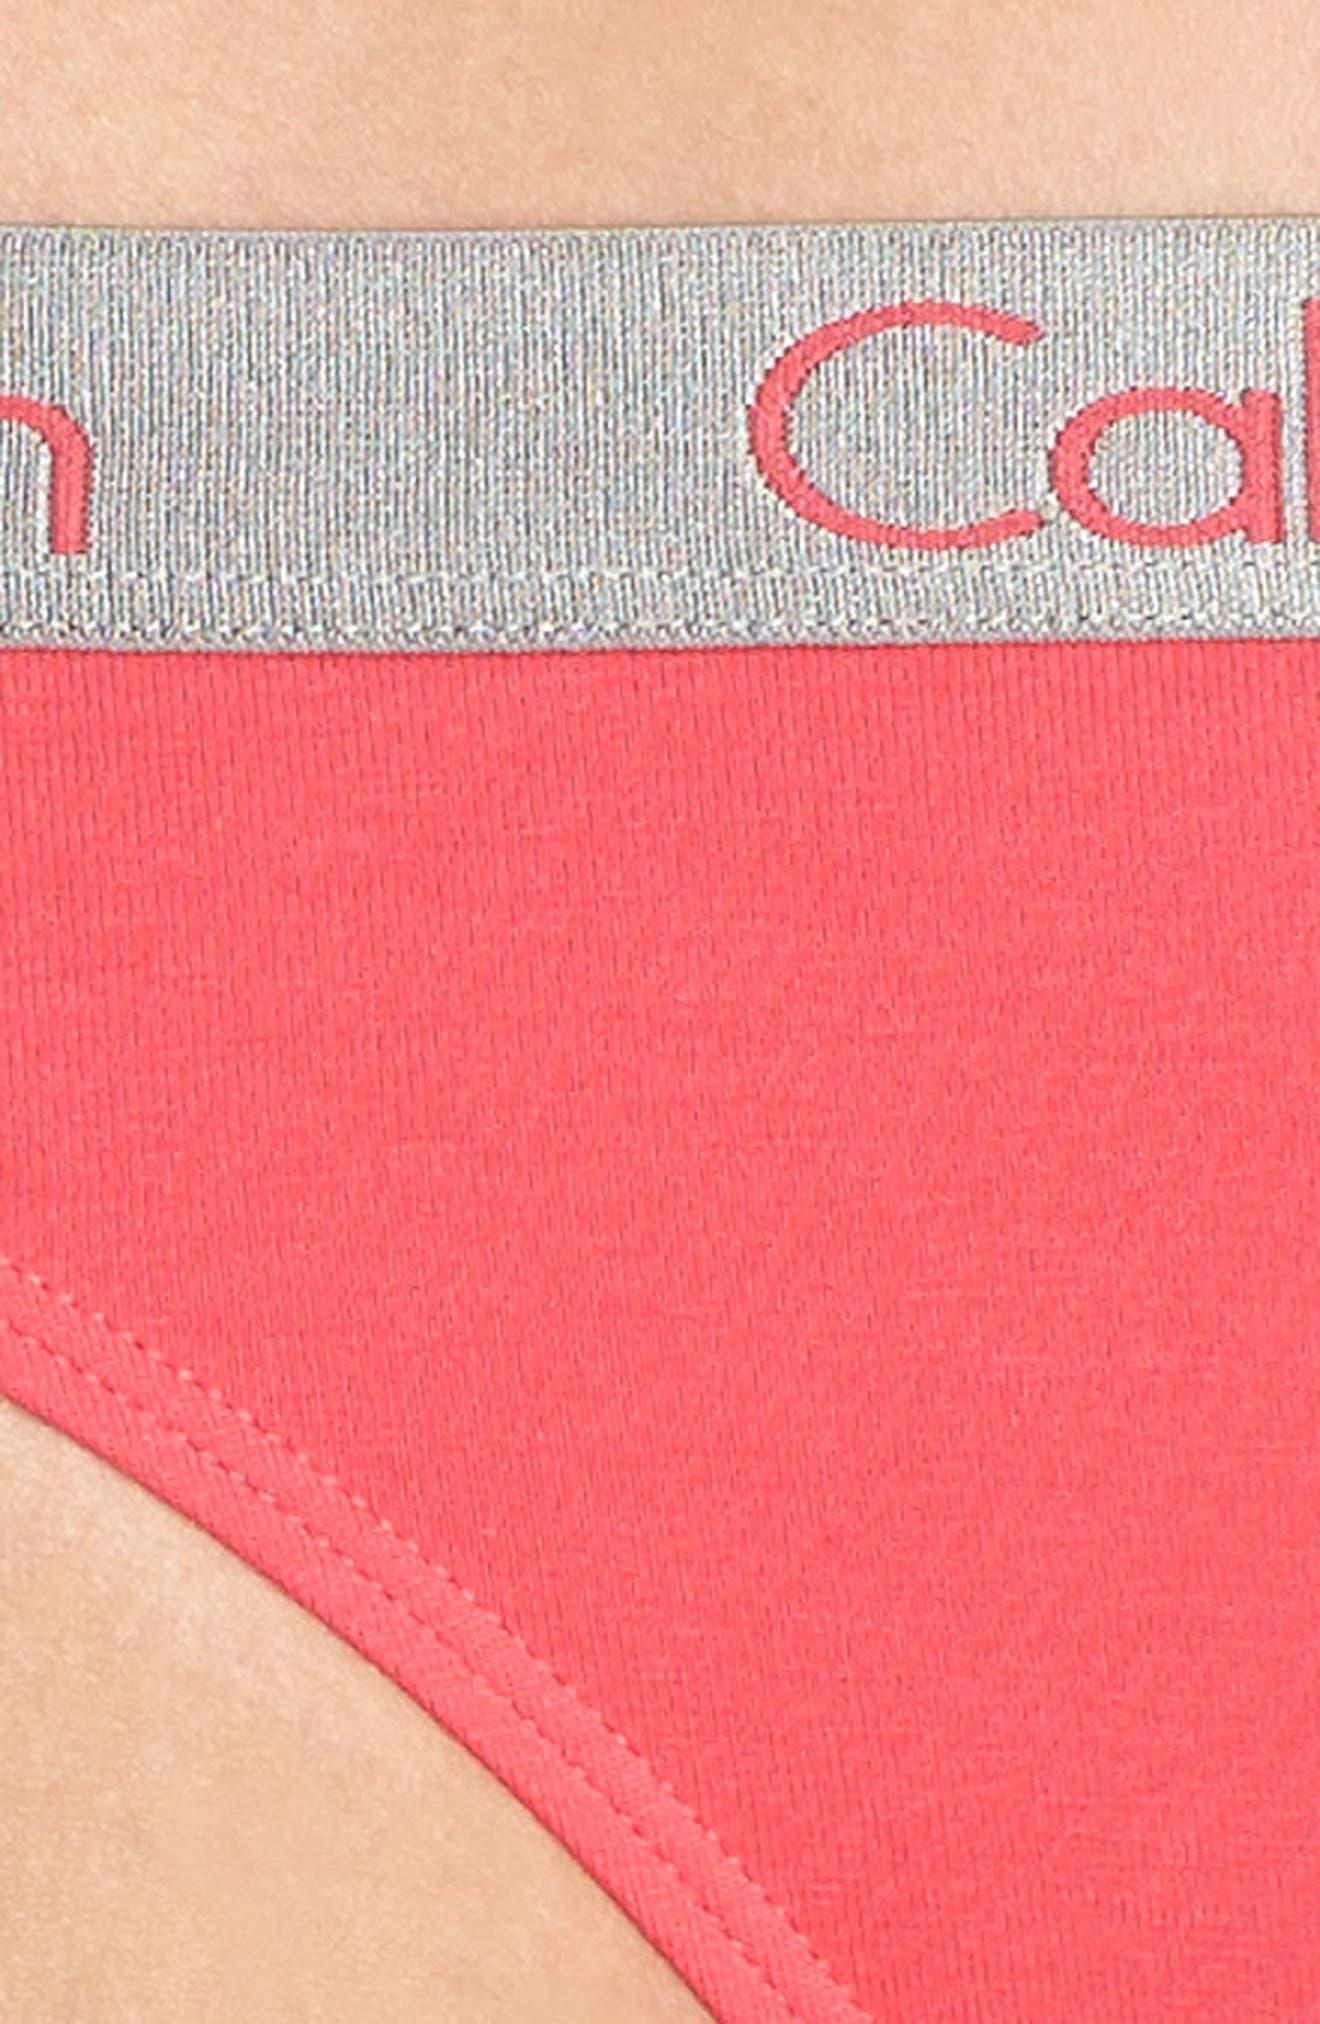 'Radiant' Cotton Thong,                             Alternate thumbnail 95, color,